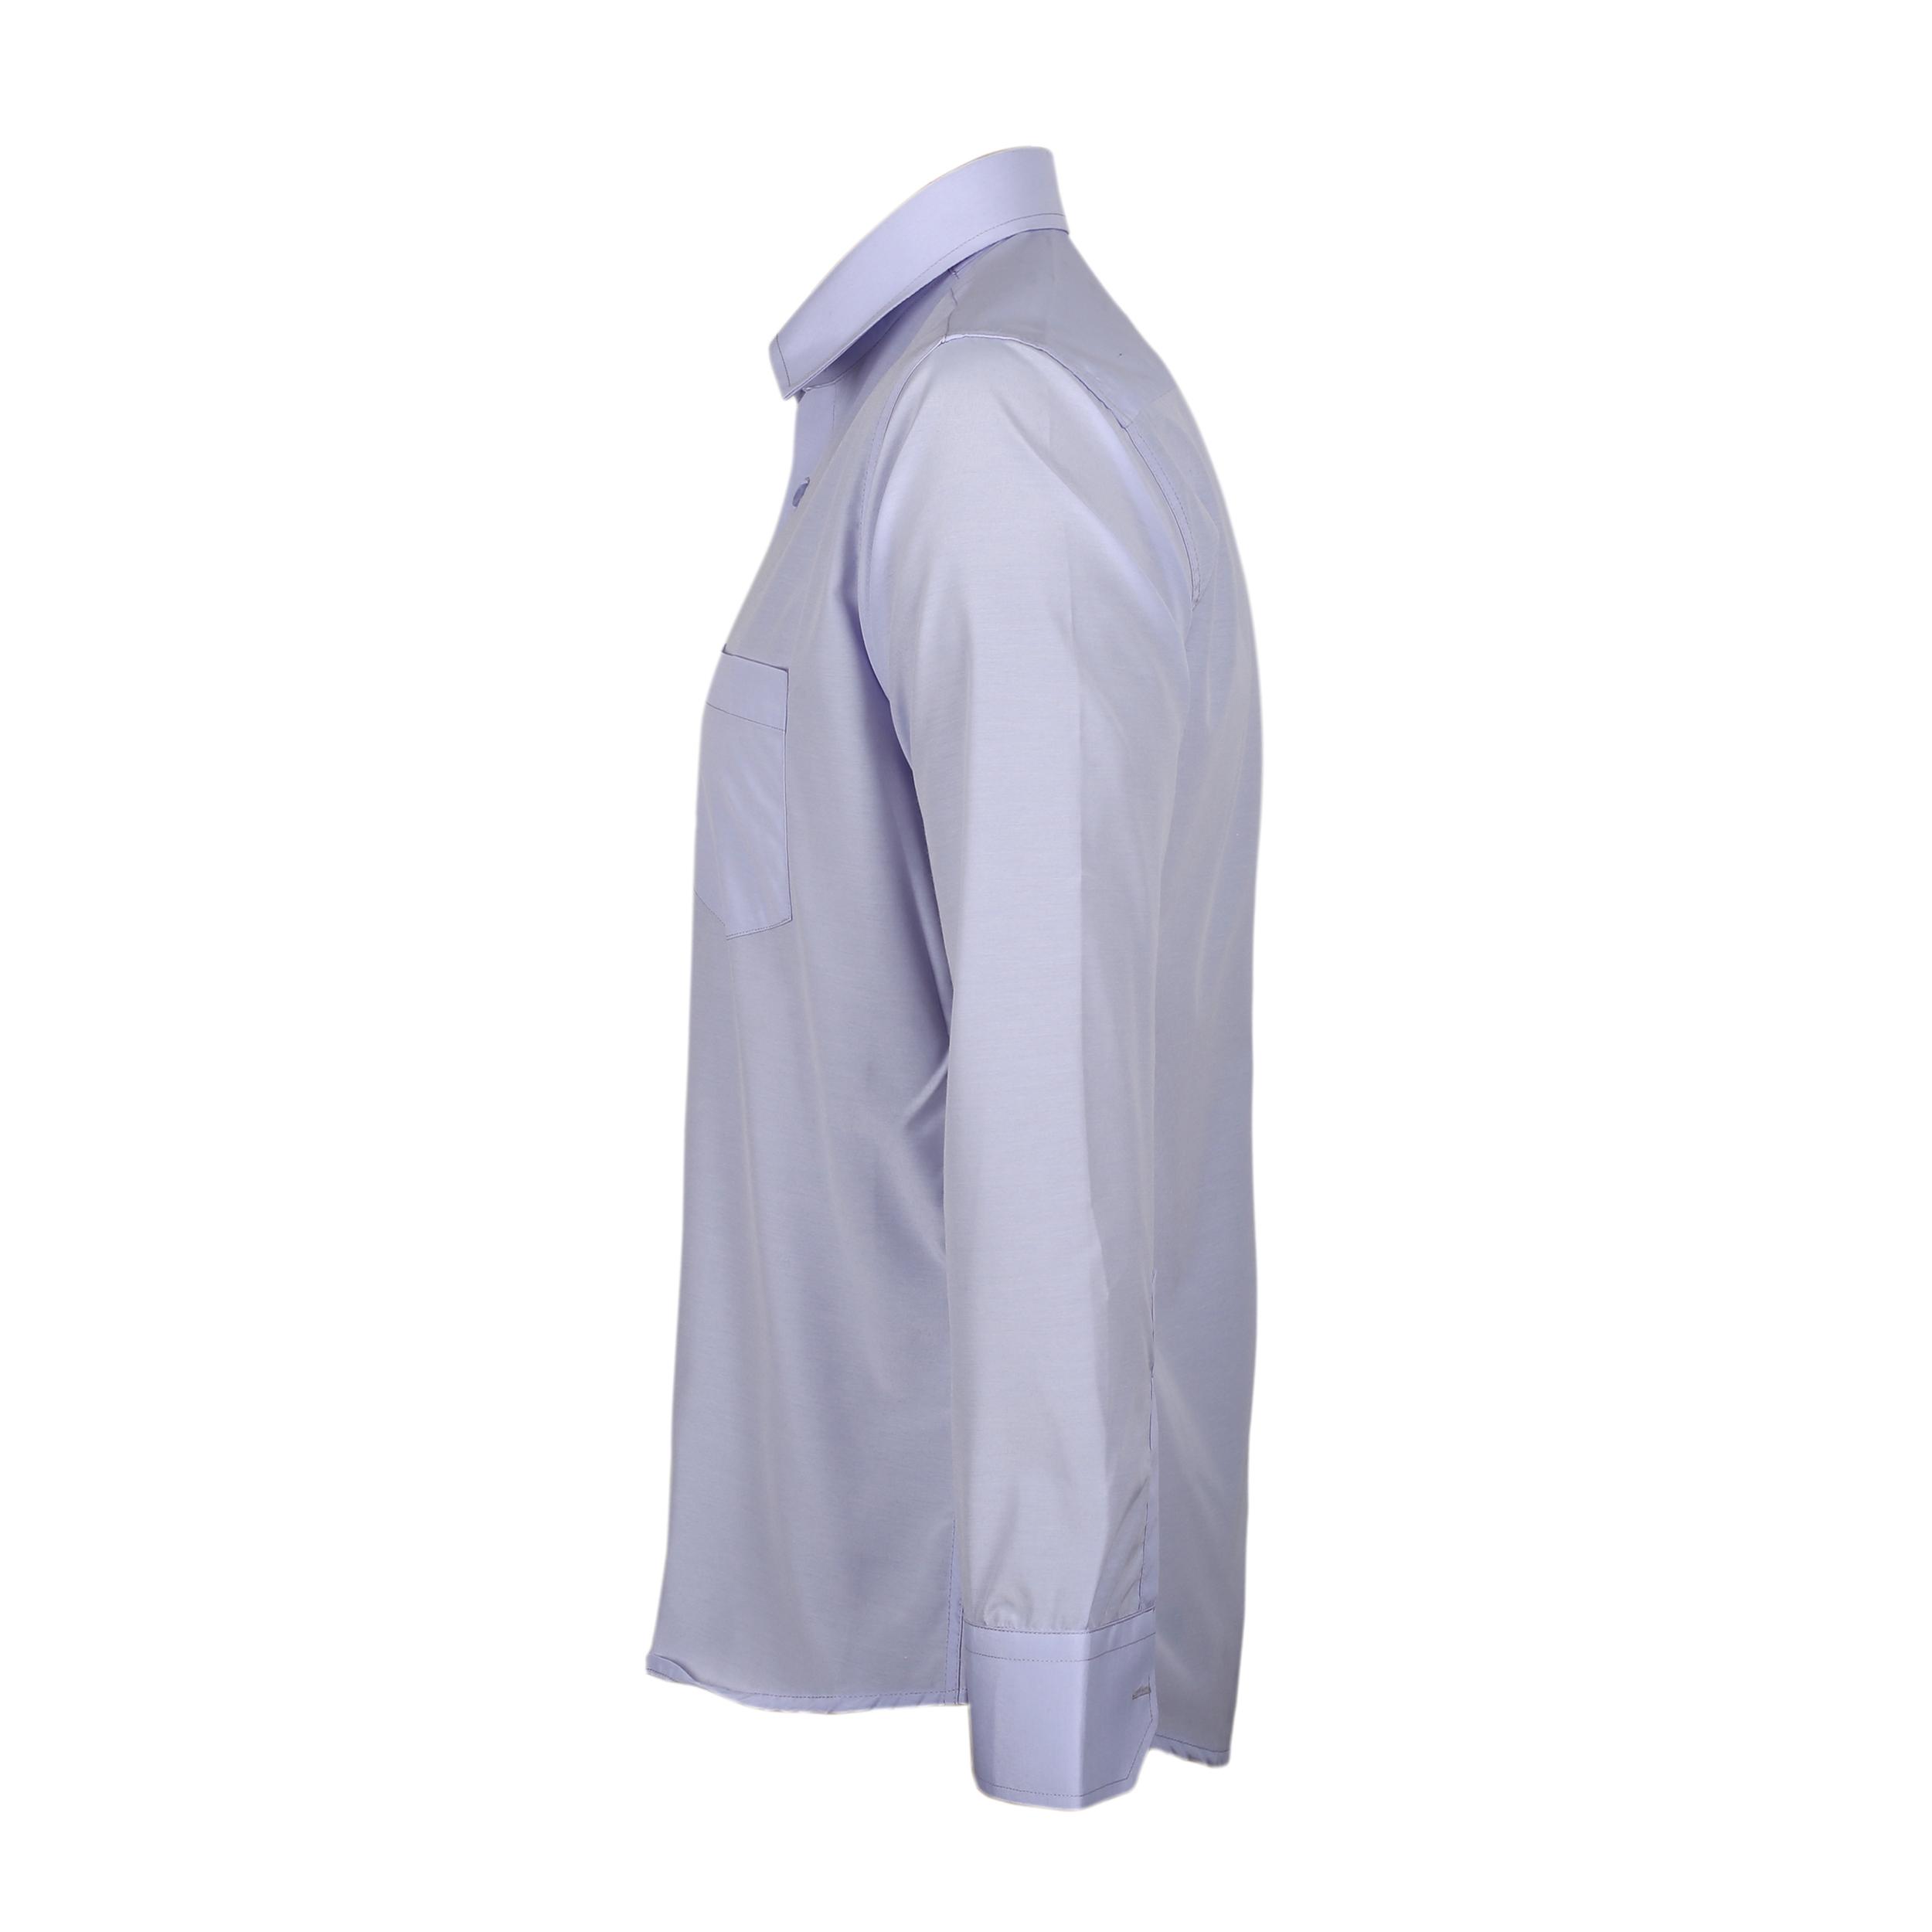 پیراهن آستین بلند مردانه ناوالس مدل TetronQ-BLi main 1 1